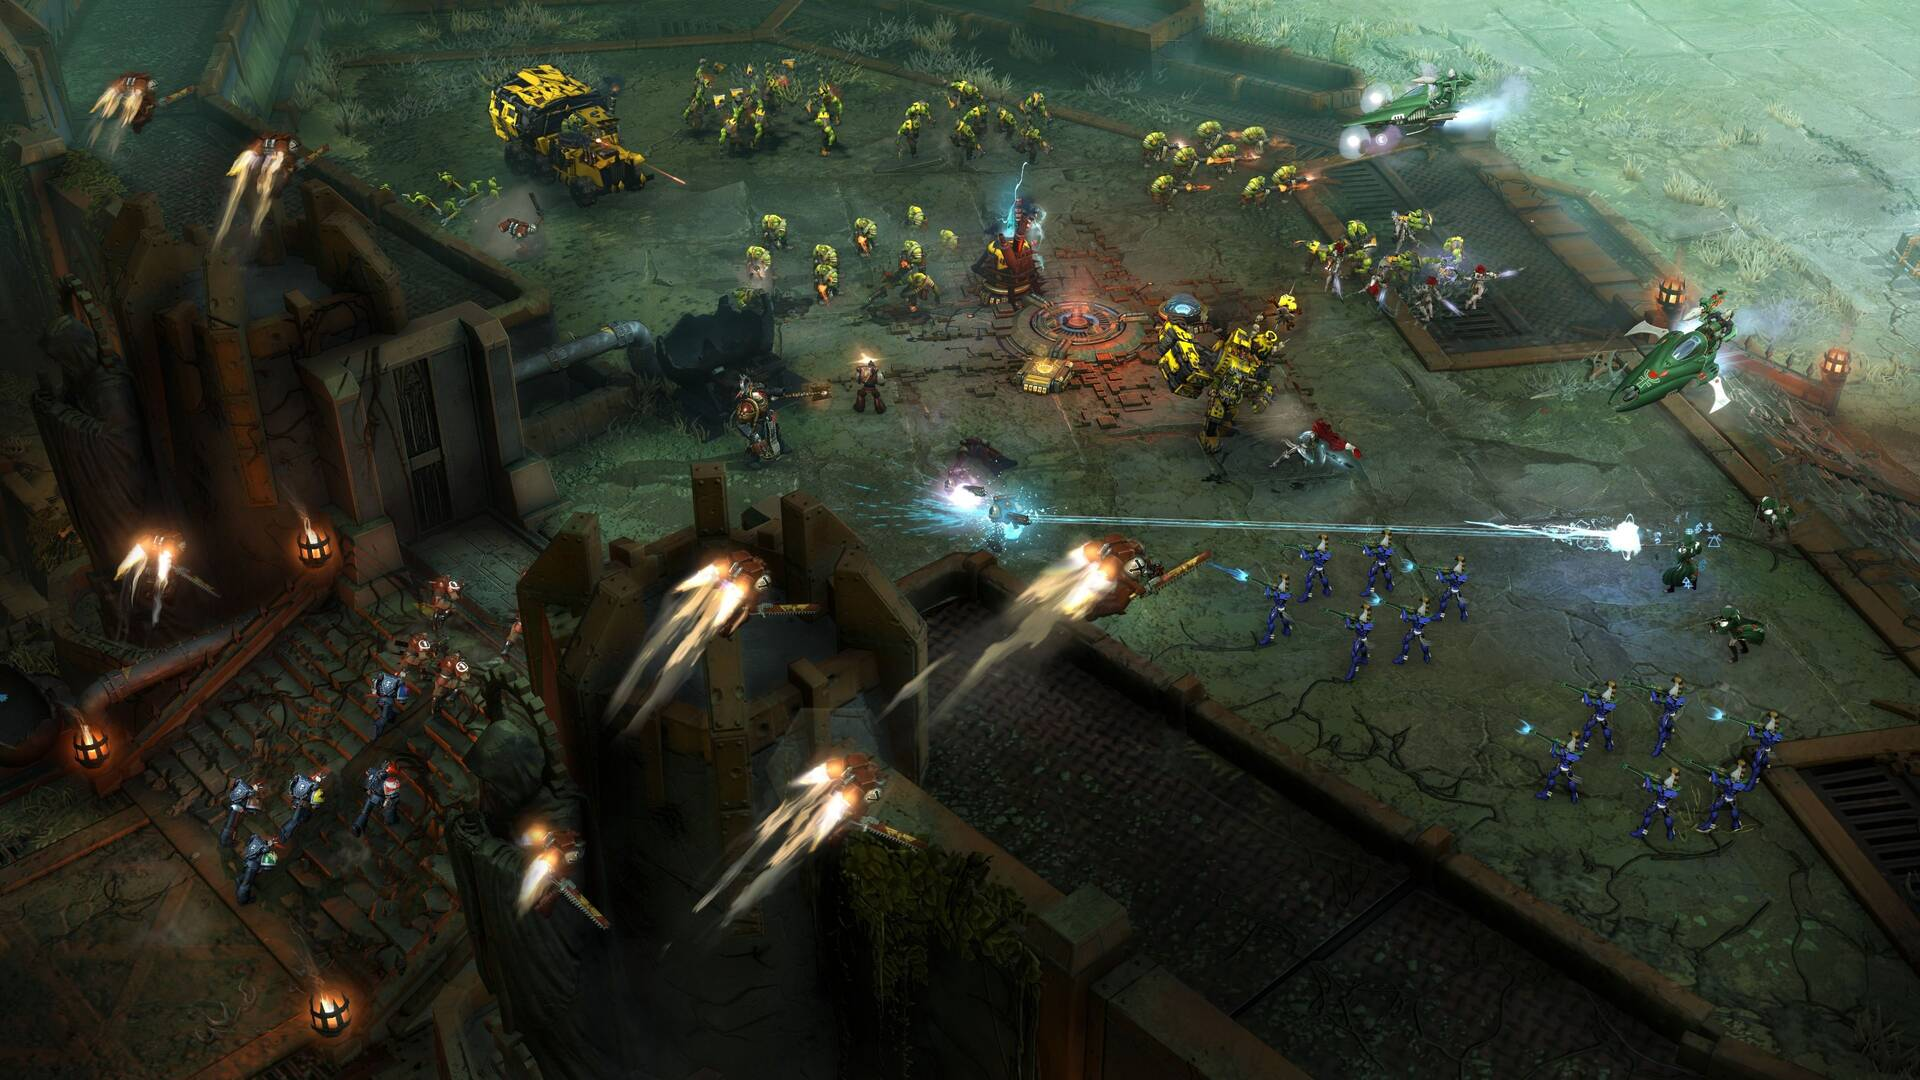 Warhammer 40K: Dawn of War III